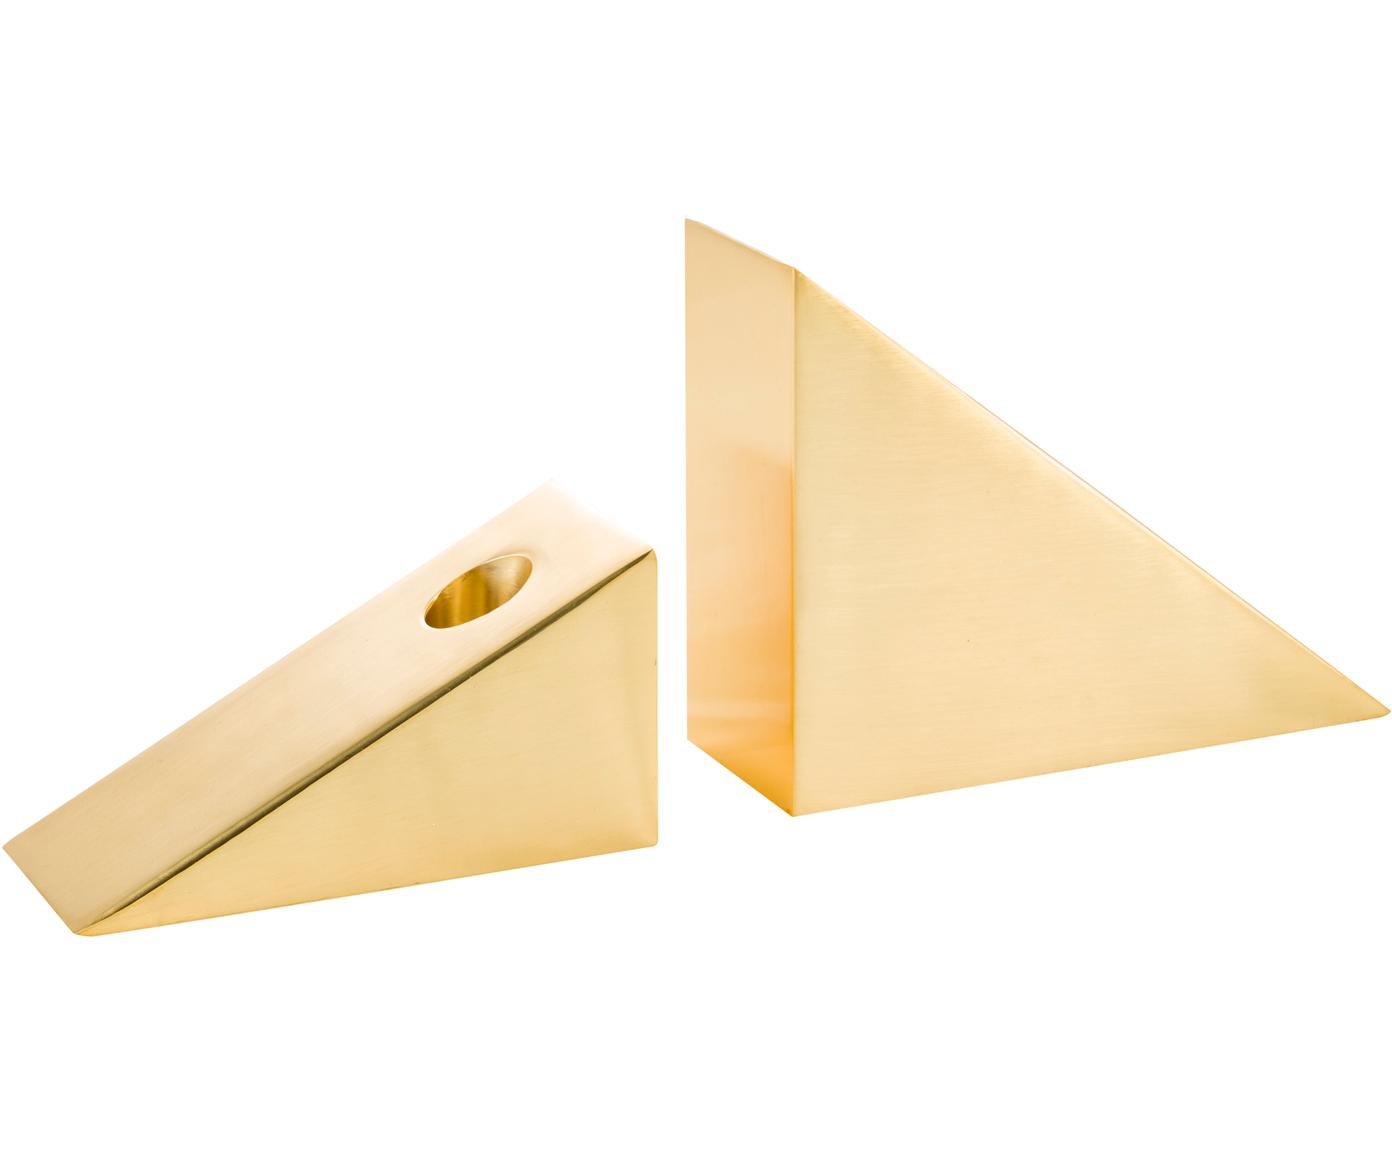 Kandelaarsset Edge, 2-delig, Edelstaal, Goudkleurig, 15 x 11 cm